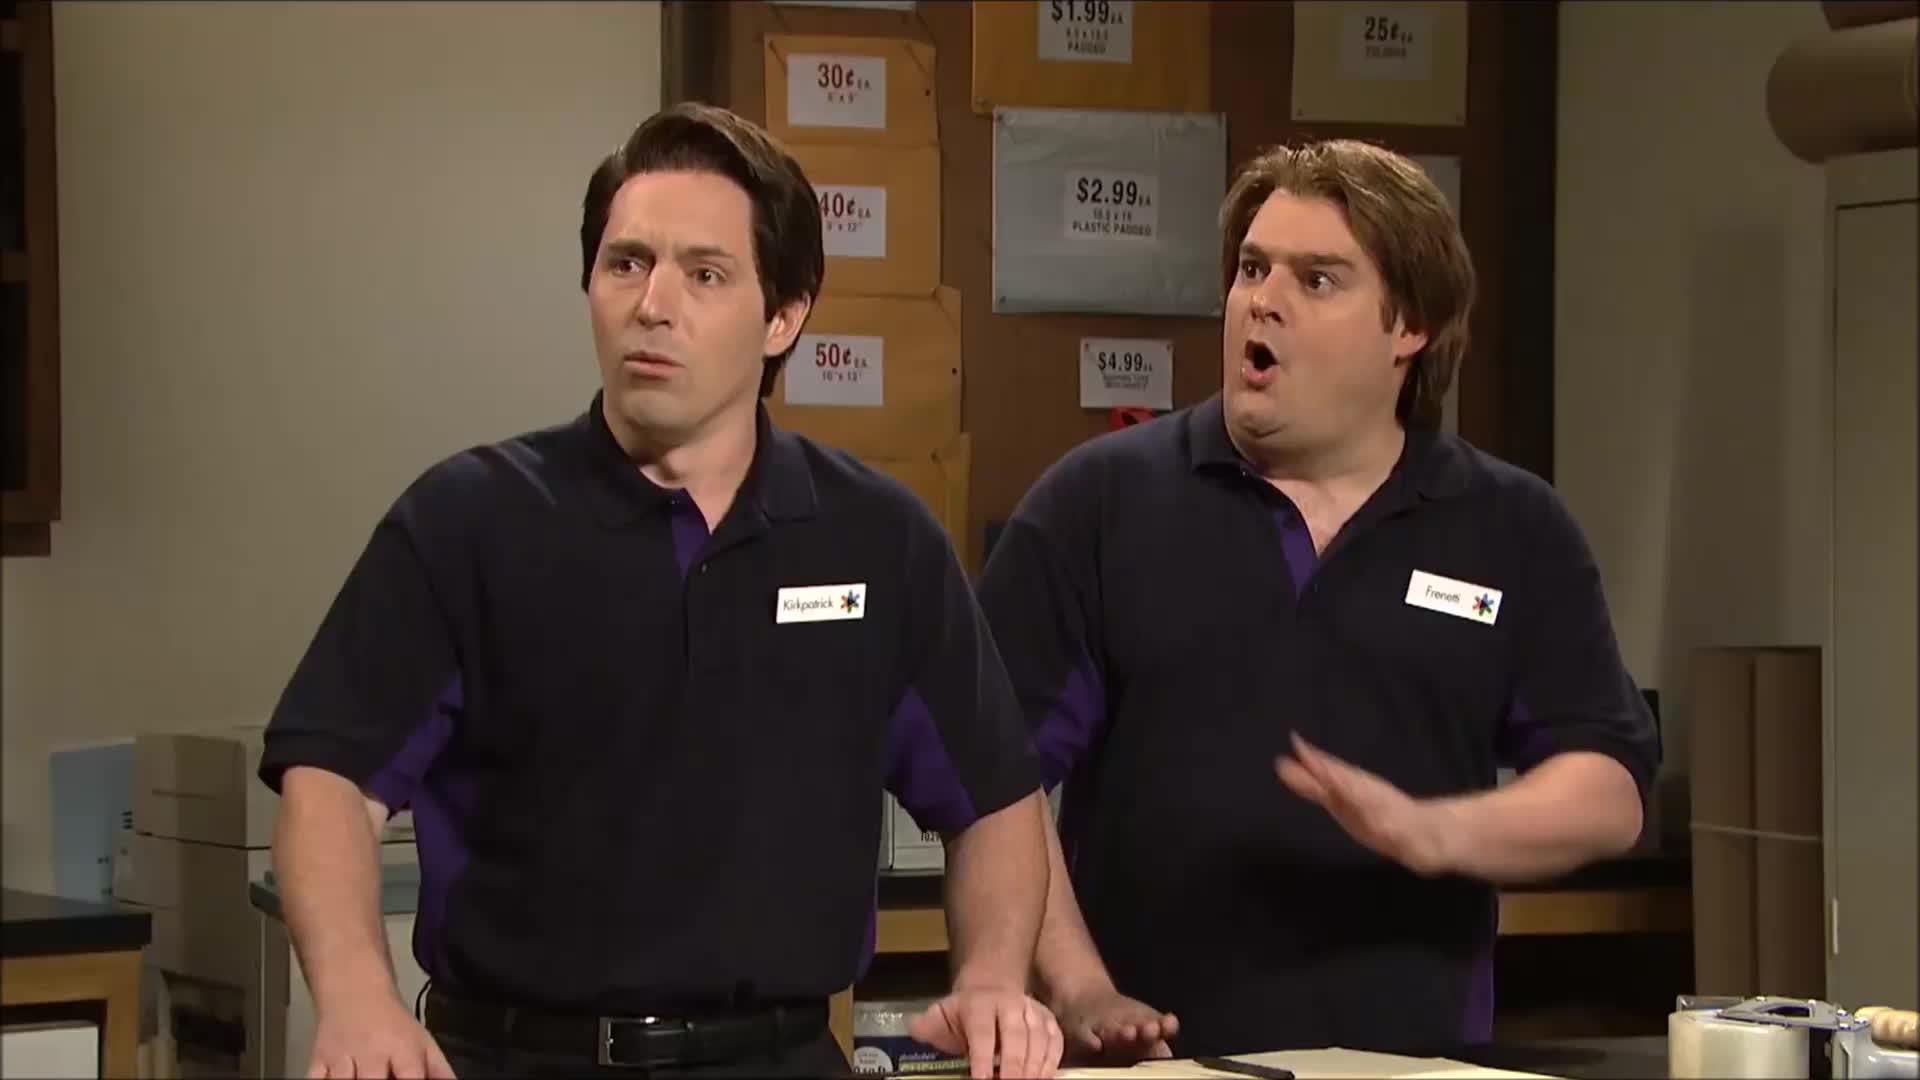 akward, awkward, saturday night live, snl, whoa, woah, Awkward SNL GIFs